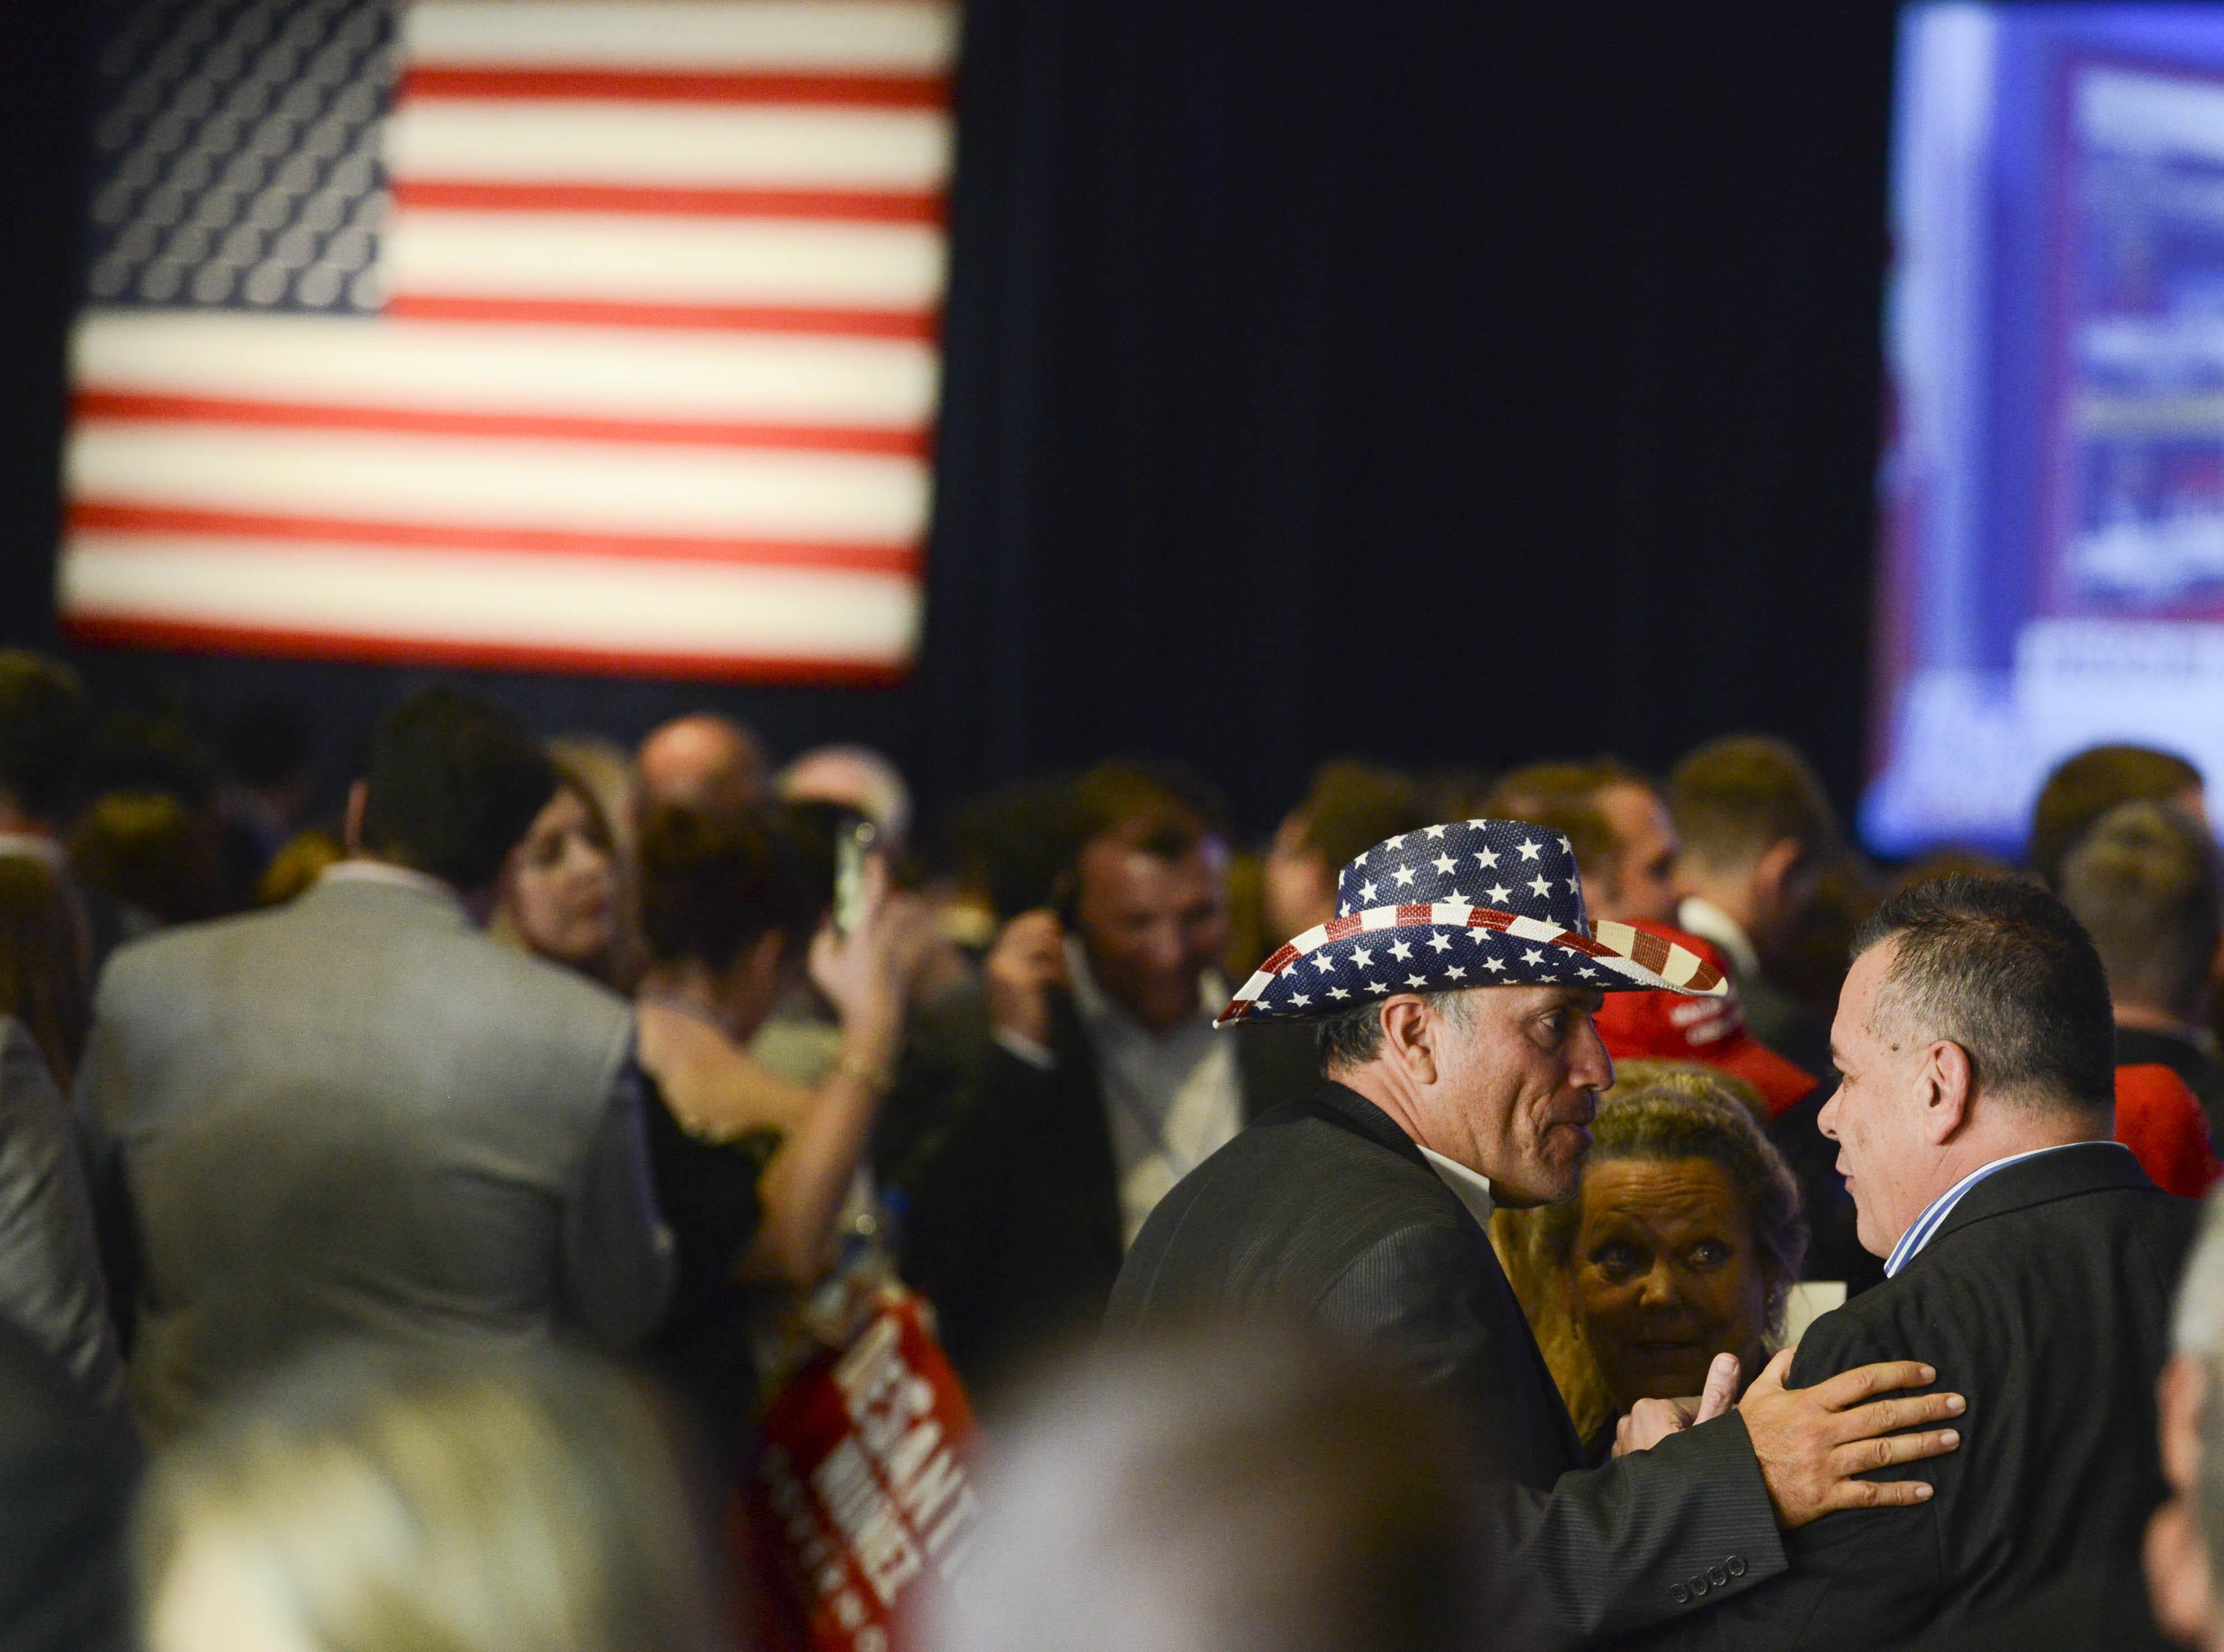 Ron DeSantis supporters hug each other after opponent Andrew Gillis conceded the Florida gubernatorial race.